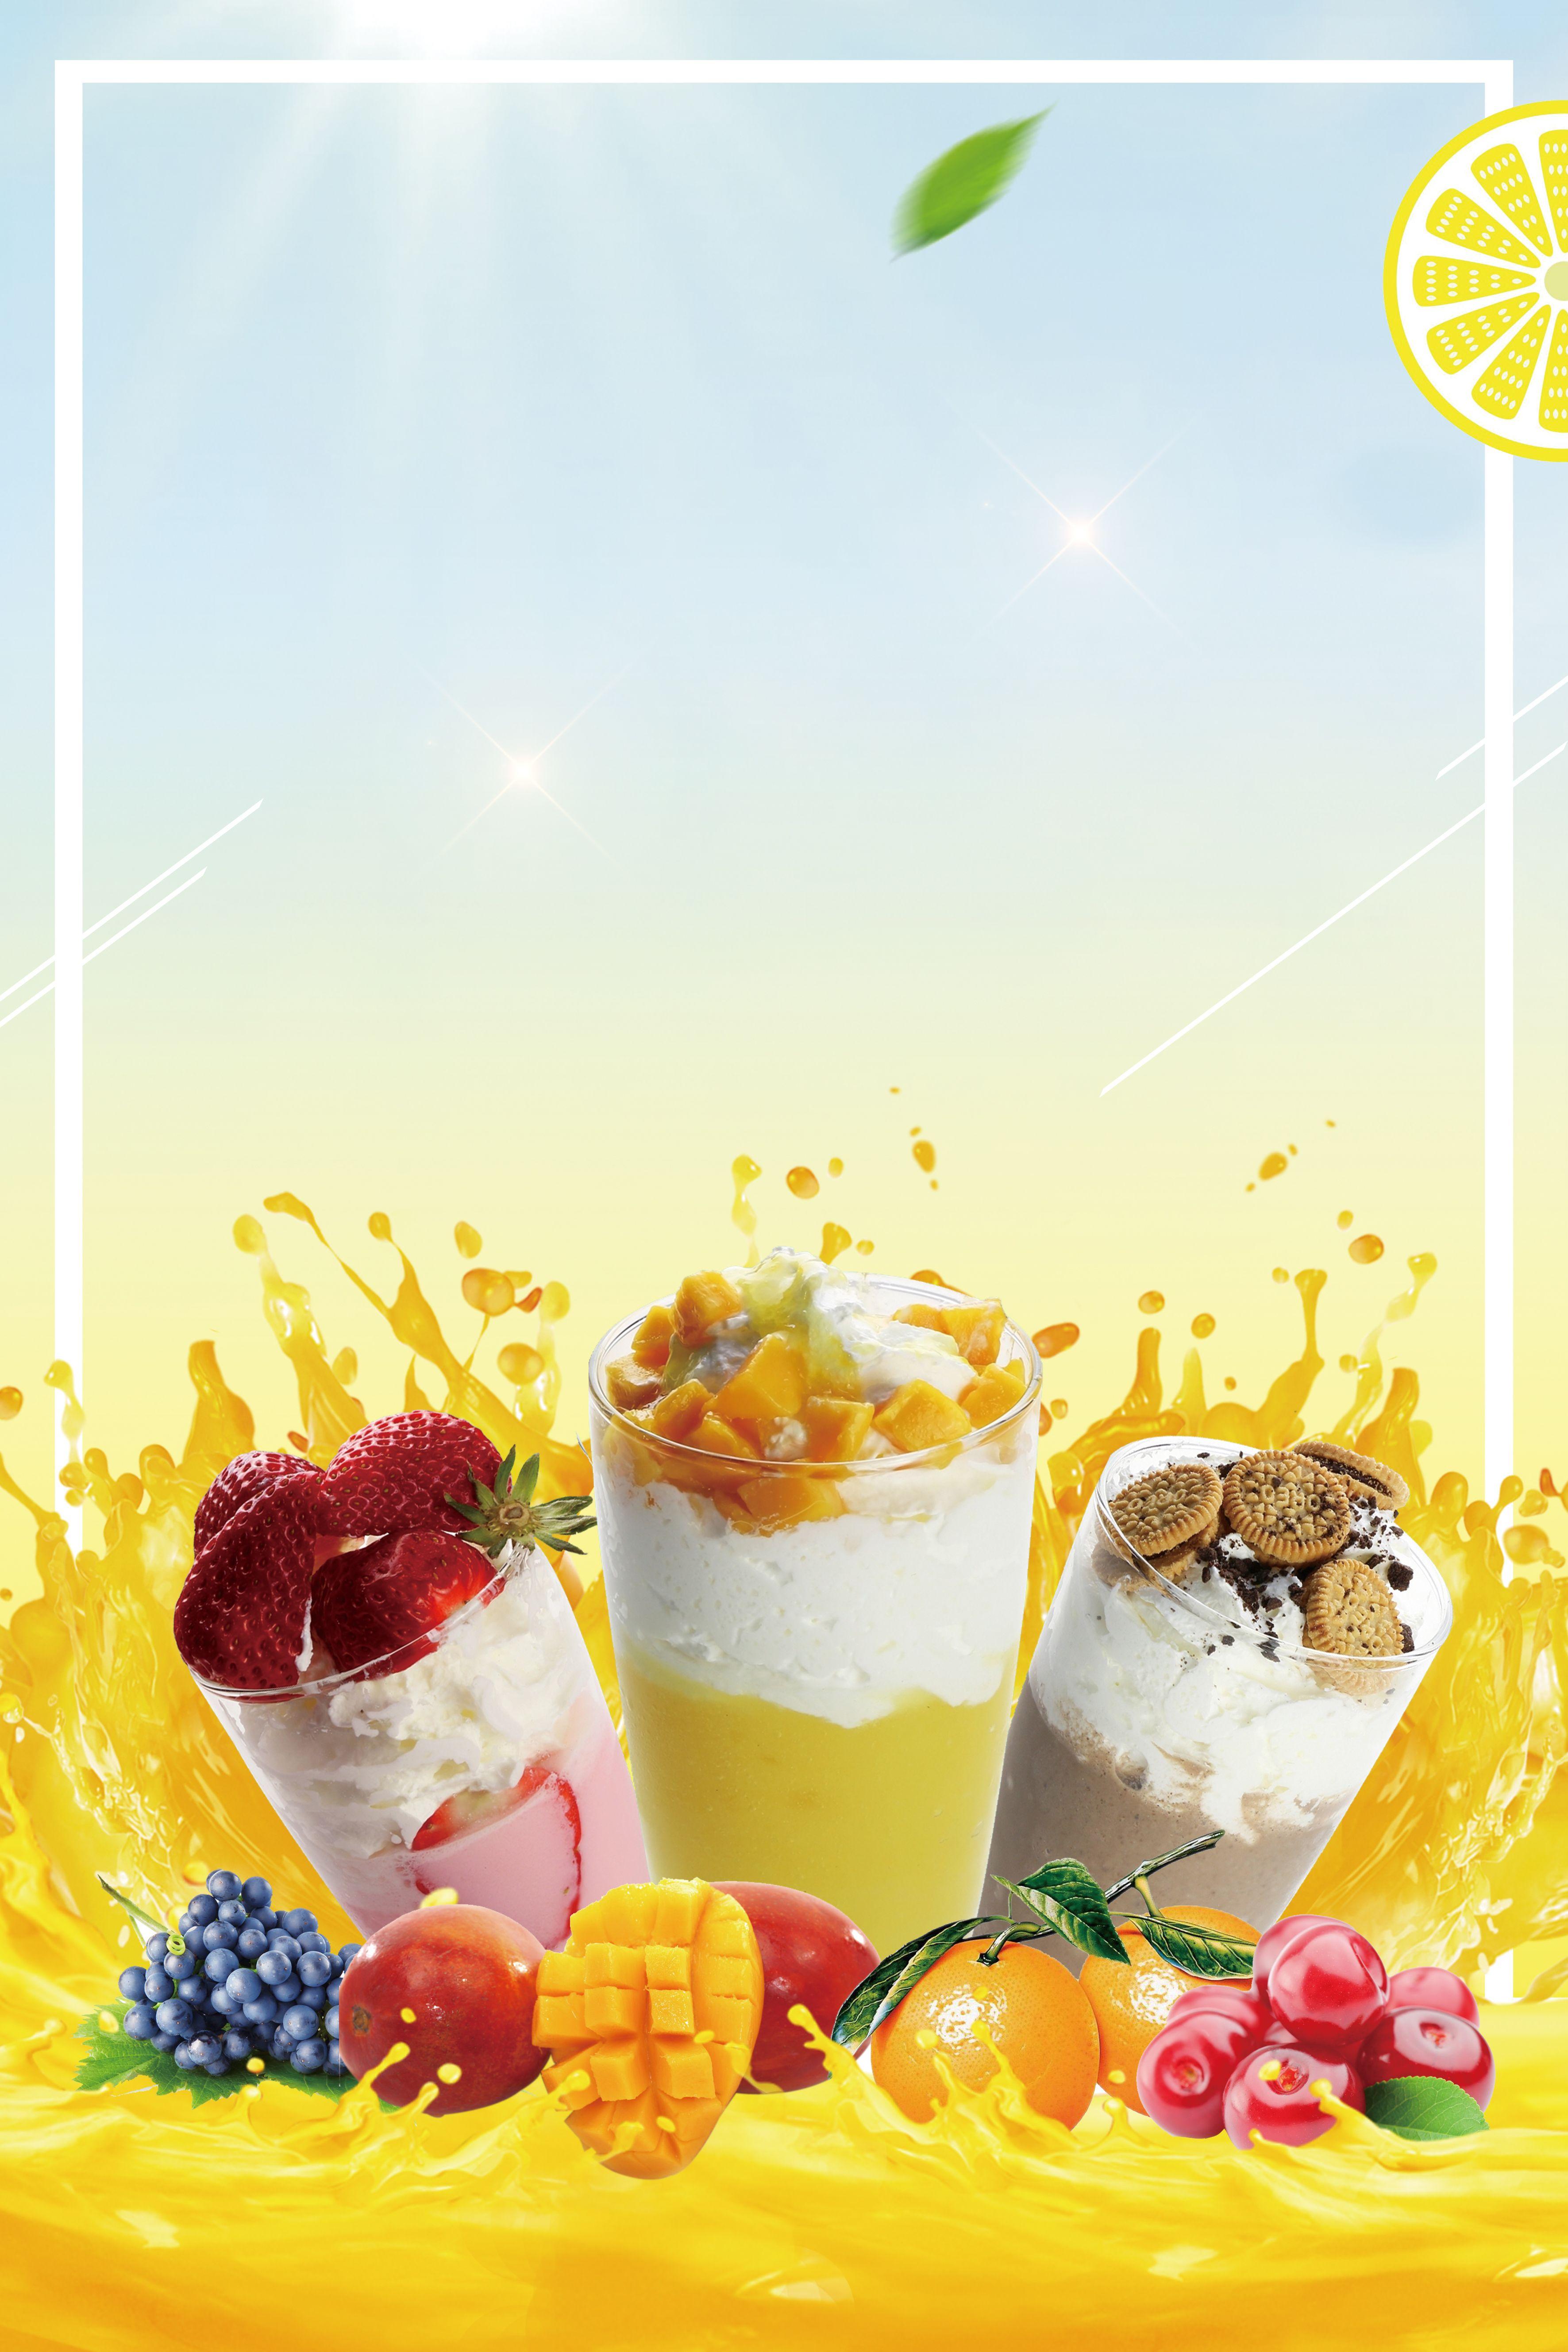 Beach Cold Drinks Fresh Fruit Silk Poster Background